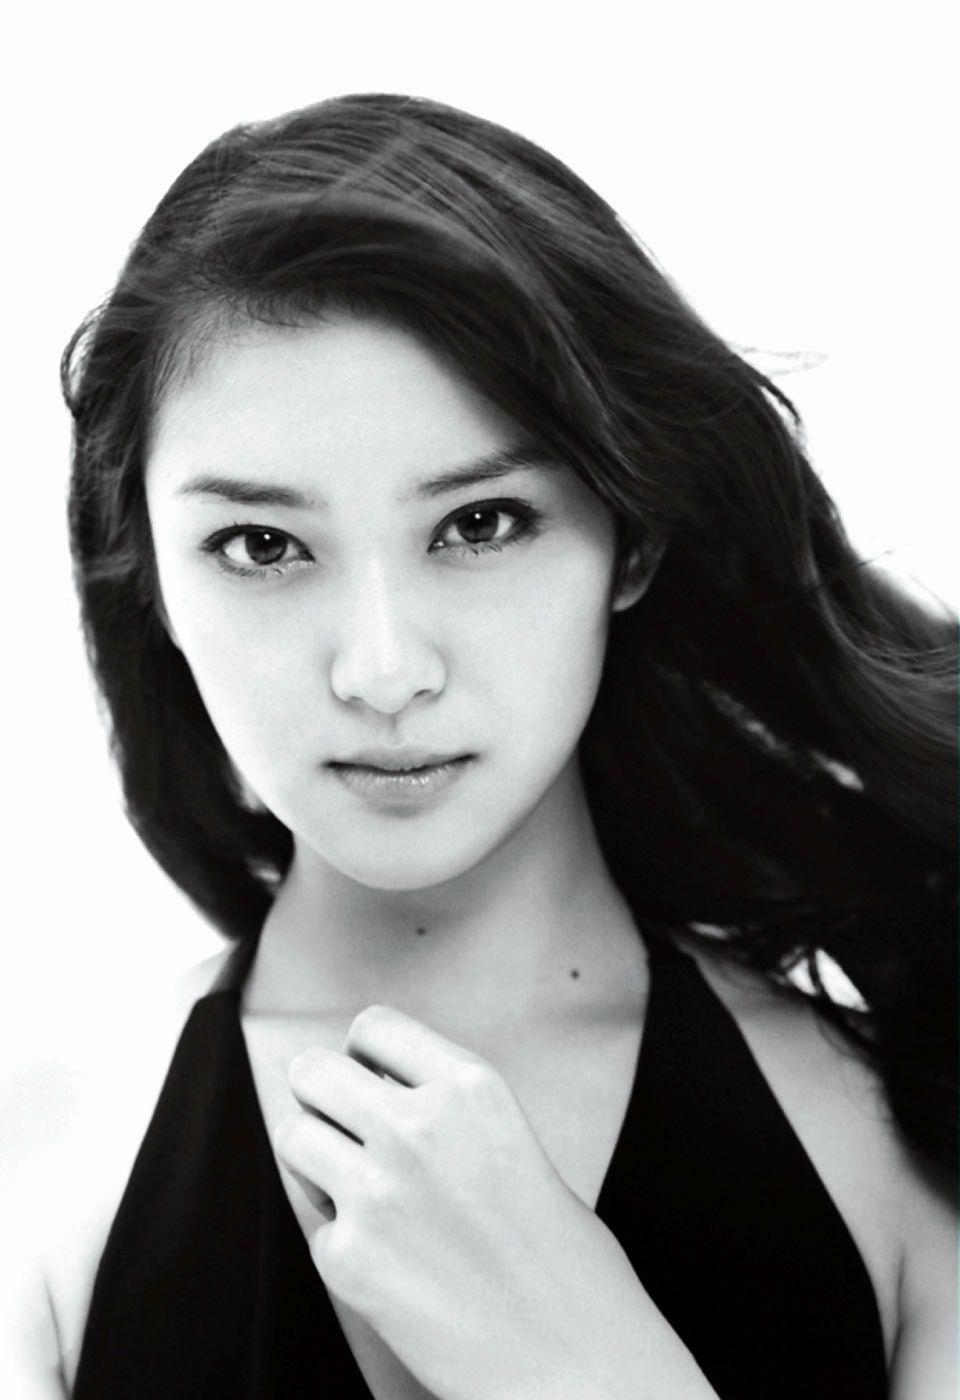 Emi takei japanese korean beauties pinterest japanese beauty emi takei voltagebd Gallery